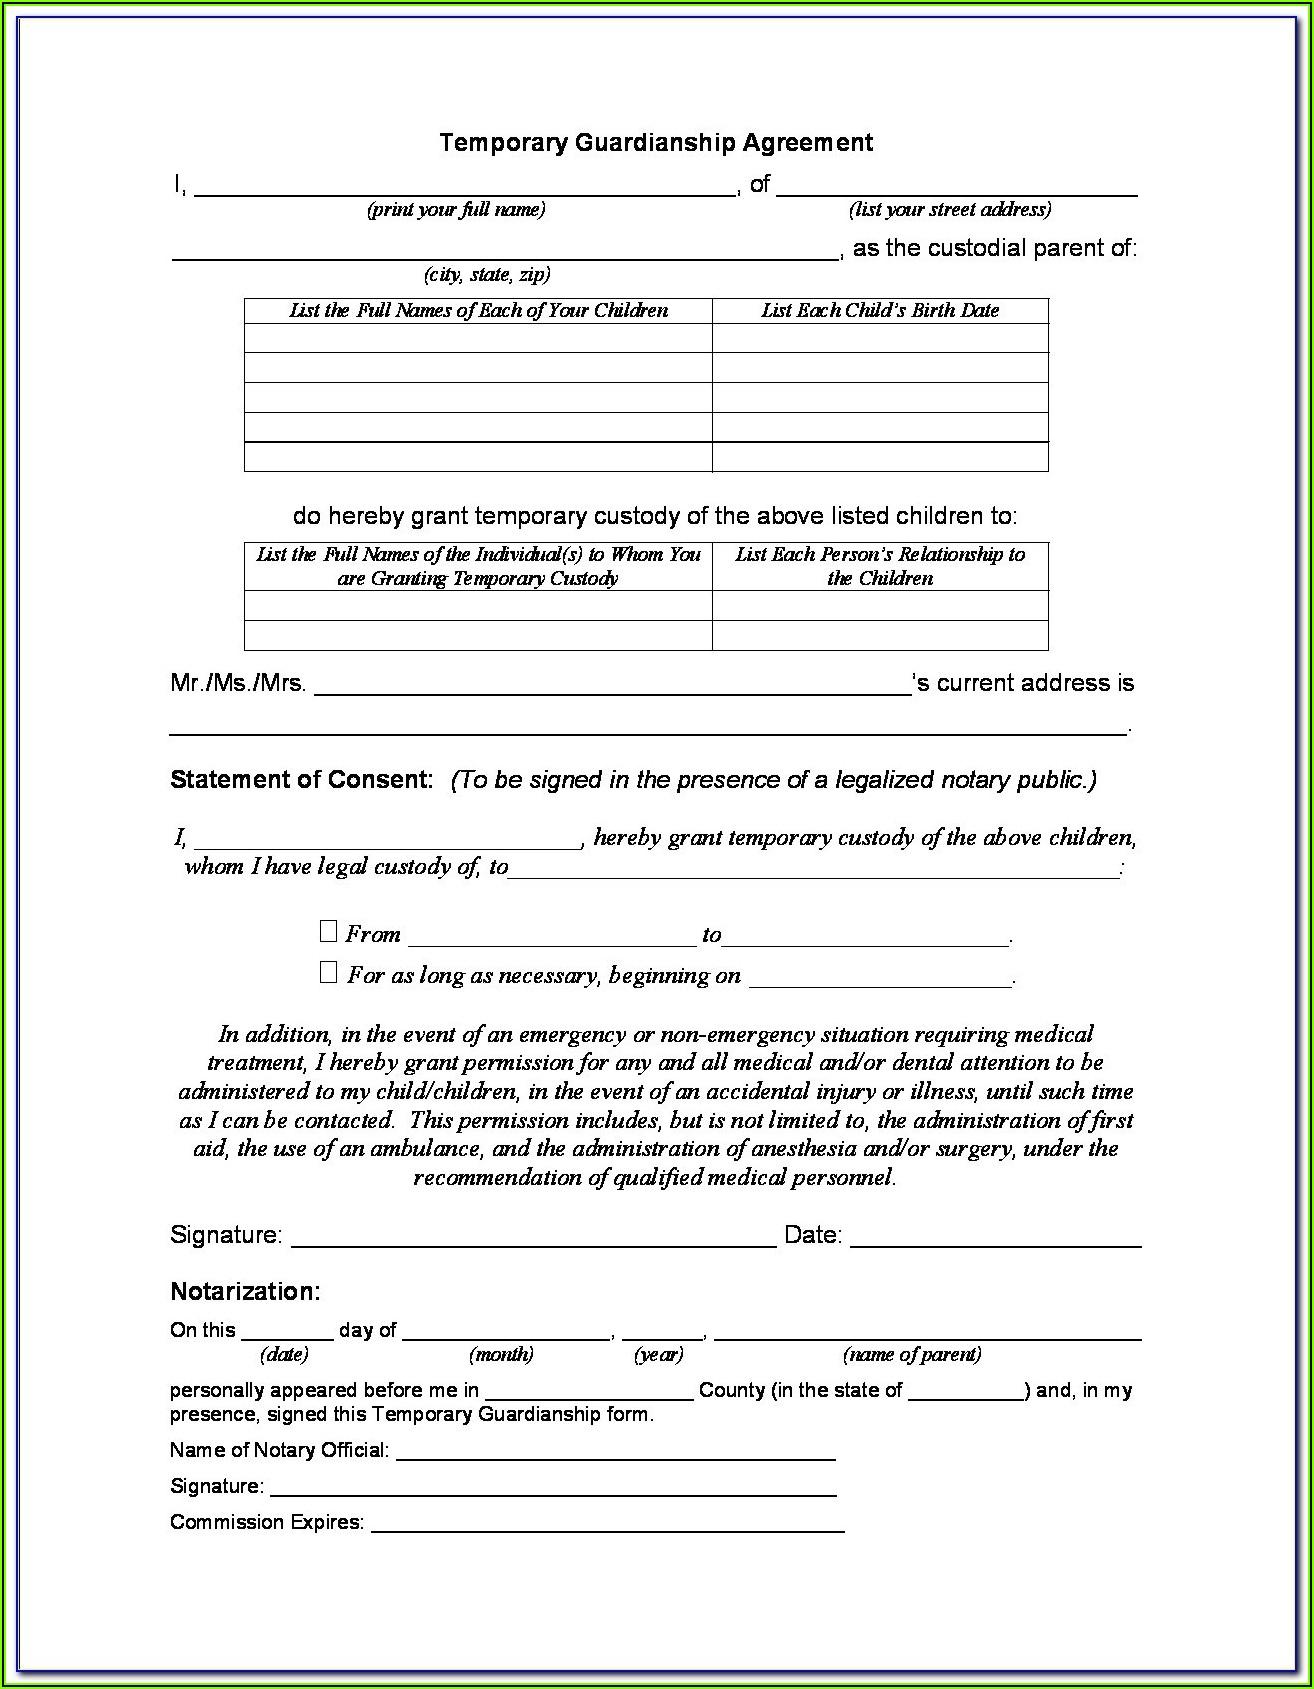 Temporary Guardianship Agreement Form Michigan